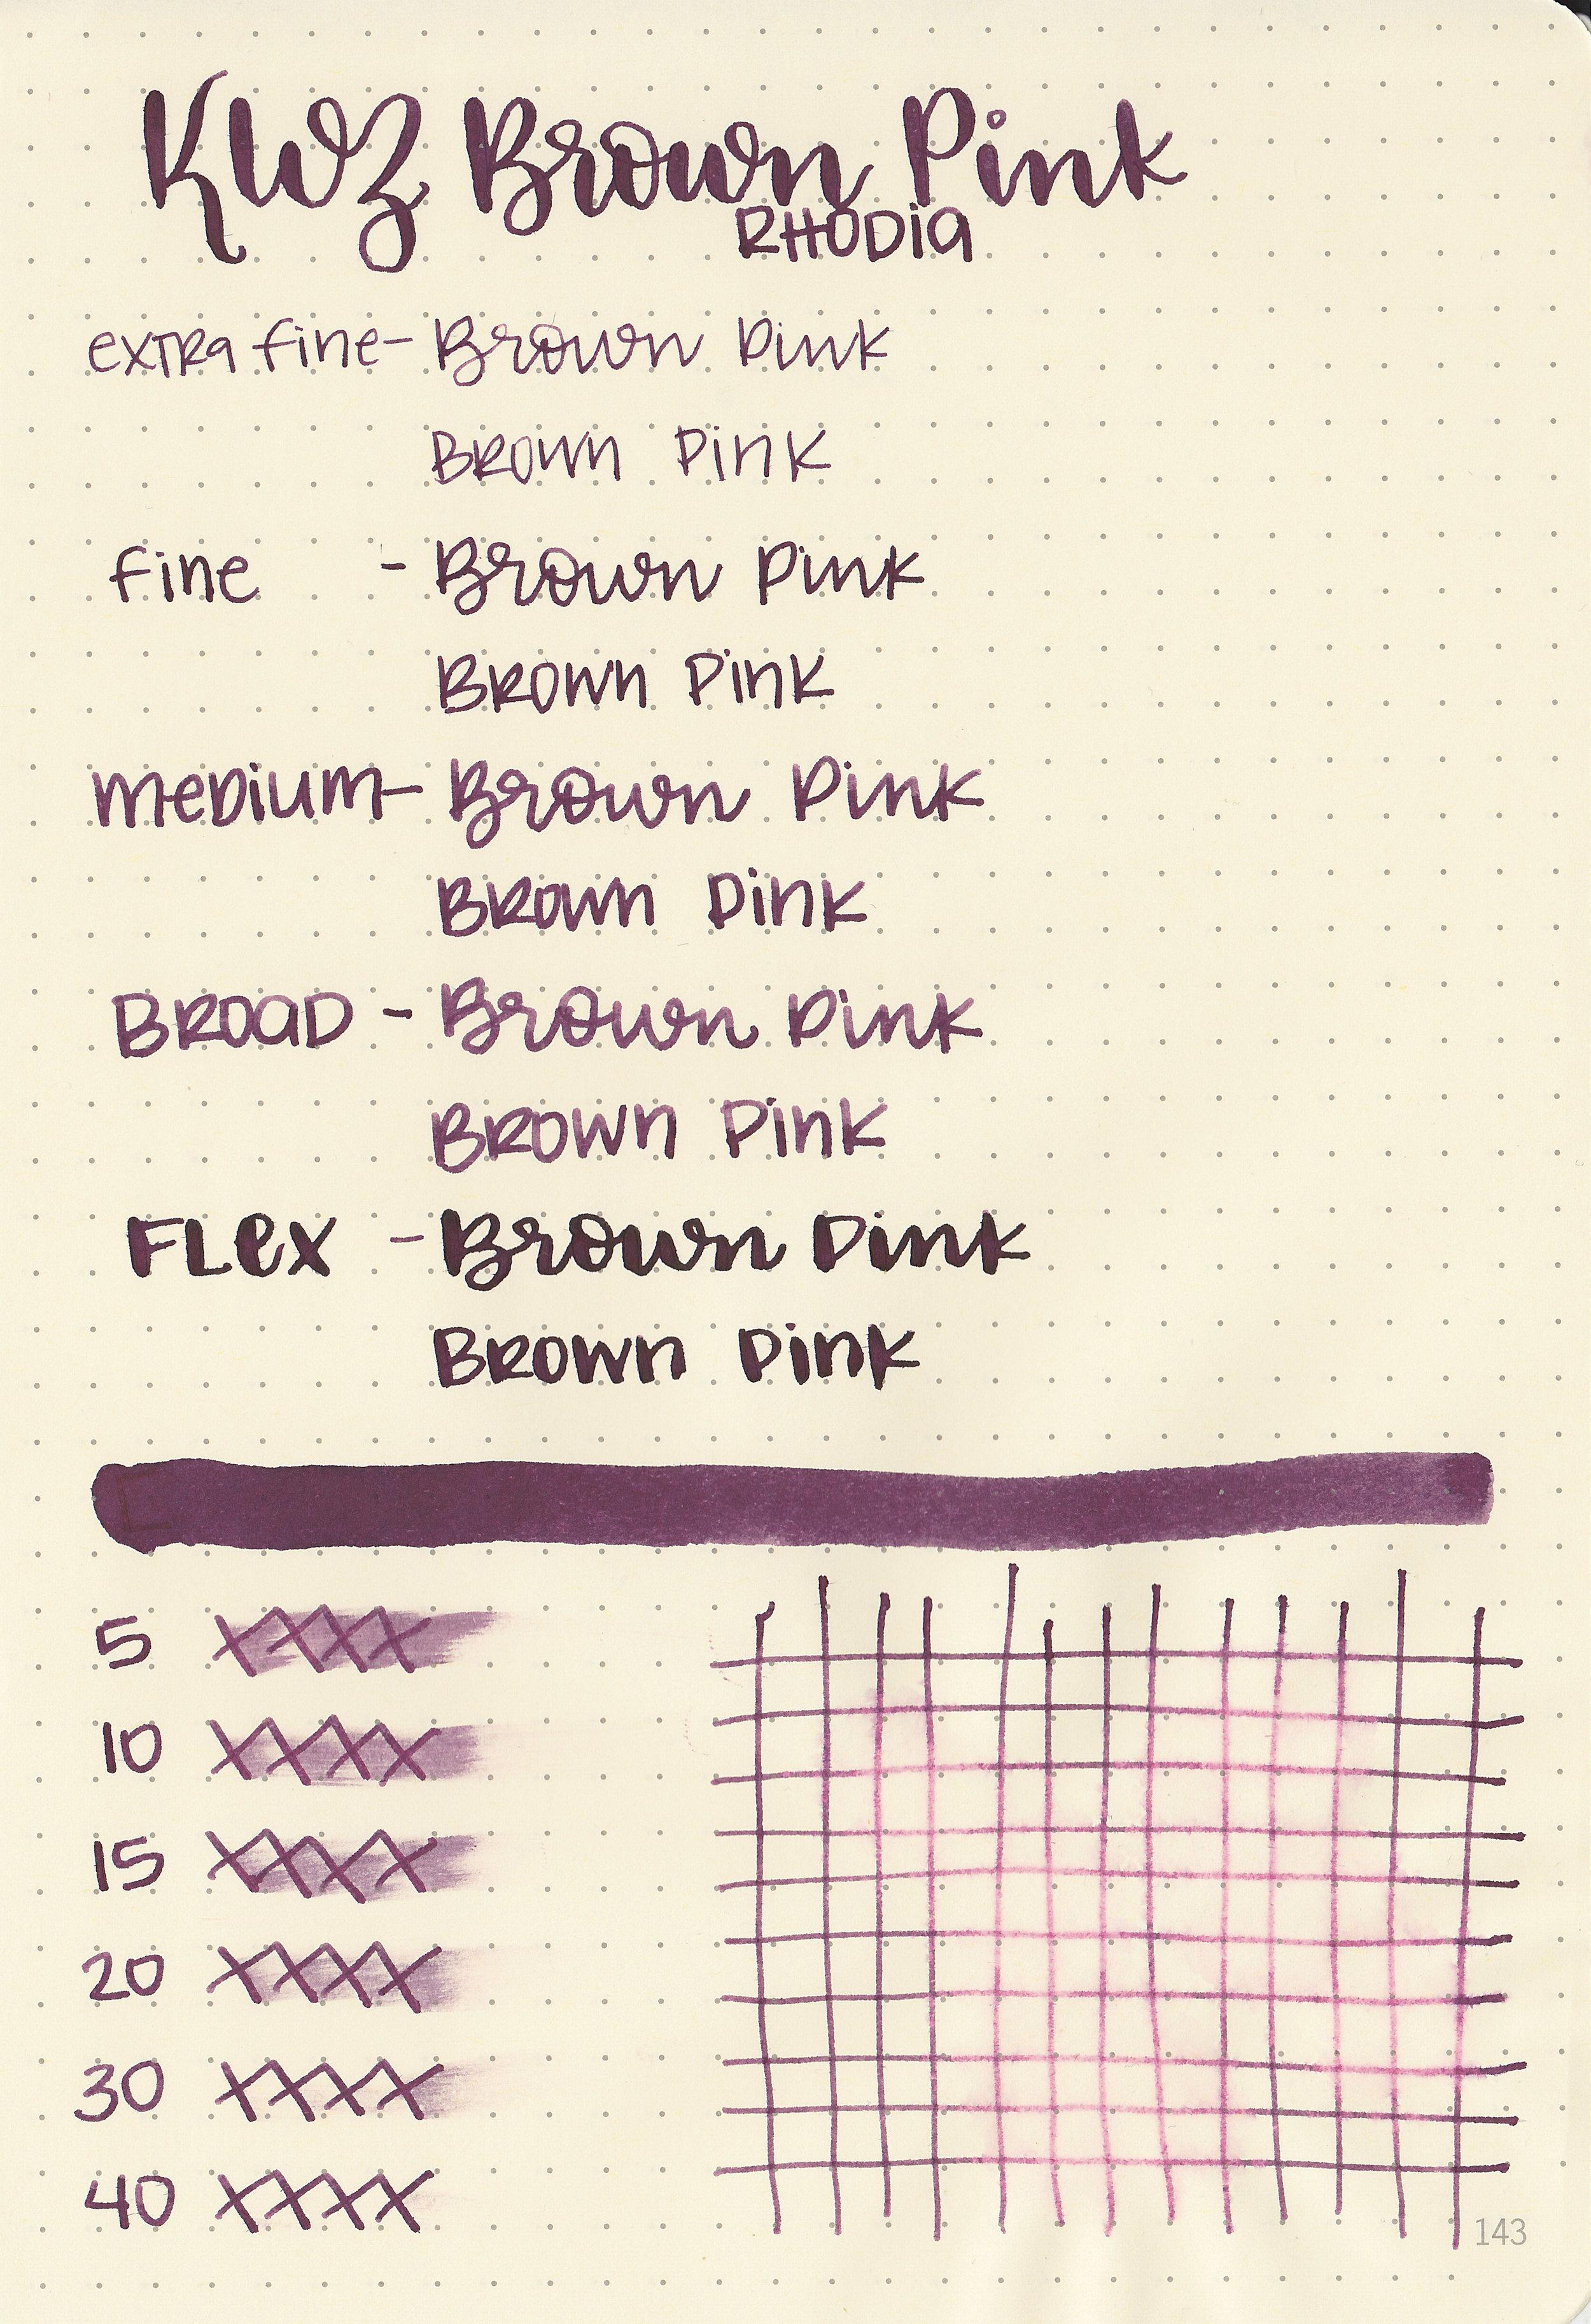 kwz-brown-pink-3.jpg